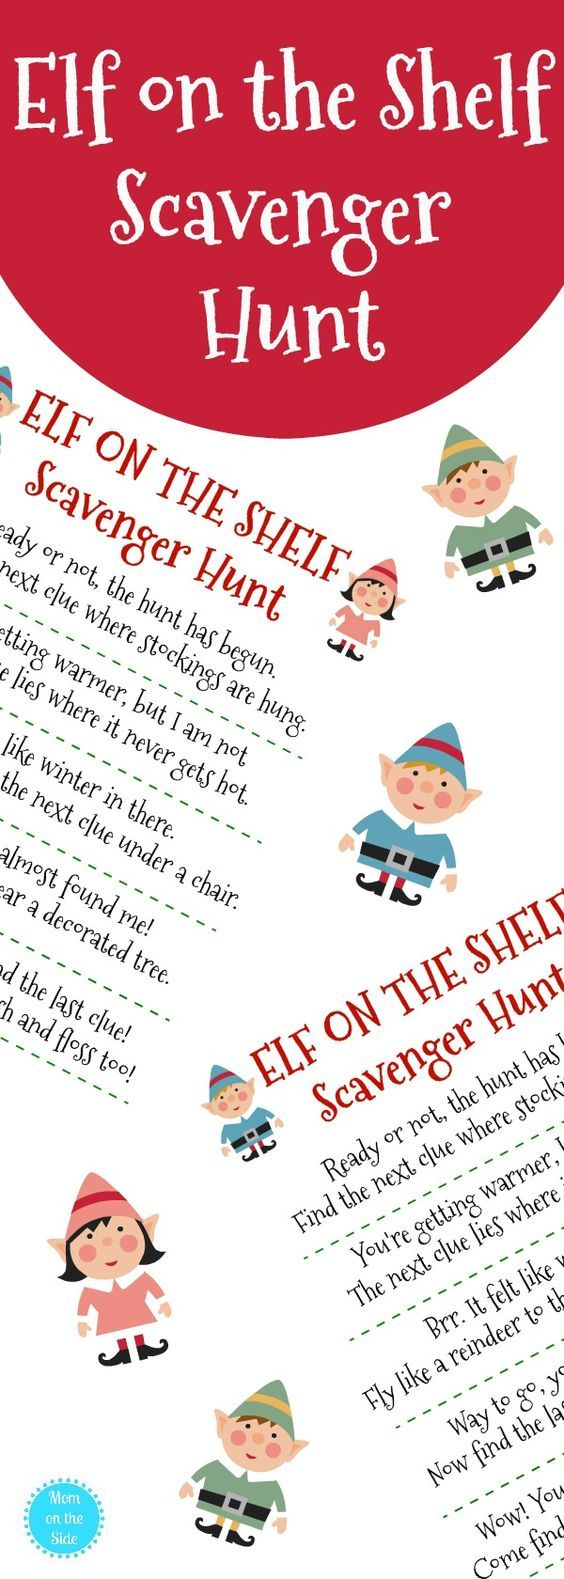 Need elf on the shelf ideas? Grab this free printable Elf on the Shelf Scavenger Hunt for Christmas the kids will love! #elfontheshelf #elfontheshelfideas #christmas #scavengerhunt #christmastime